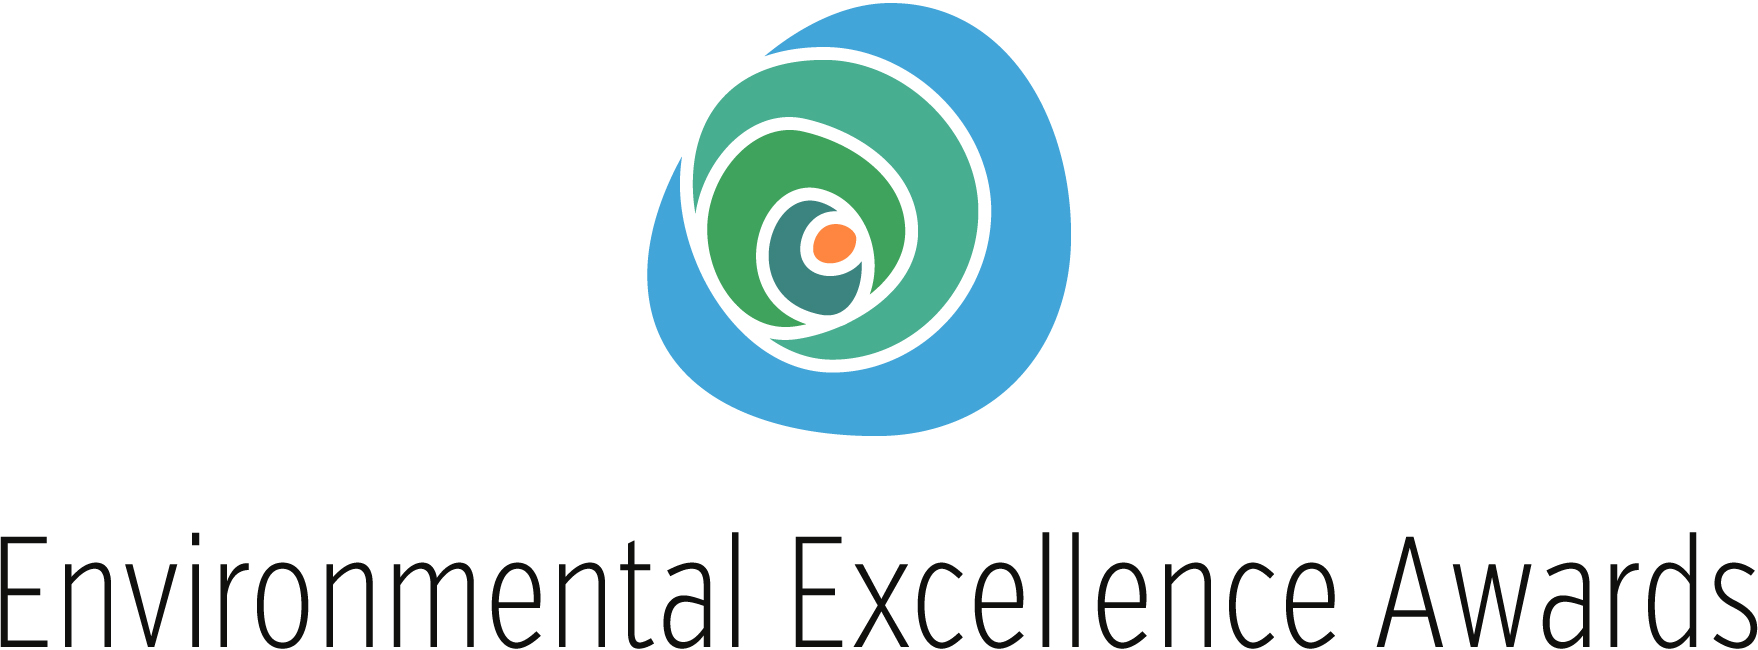 Award Winning Development  Craggy Park - Winner of the Asheville GreenWorks 2019 Environmental Excellence Awards